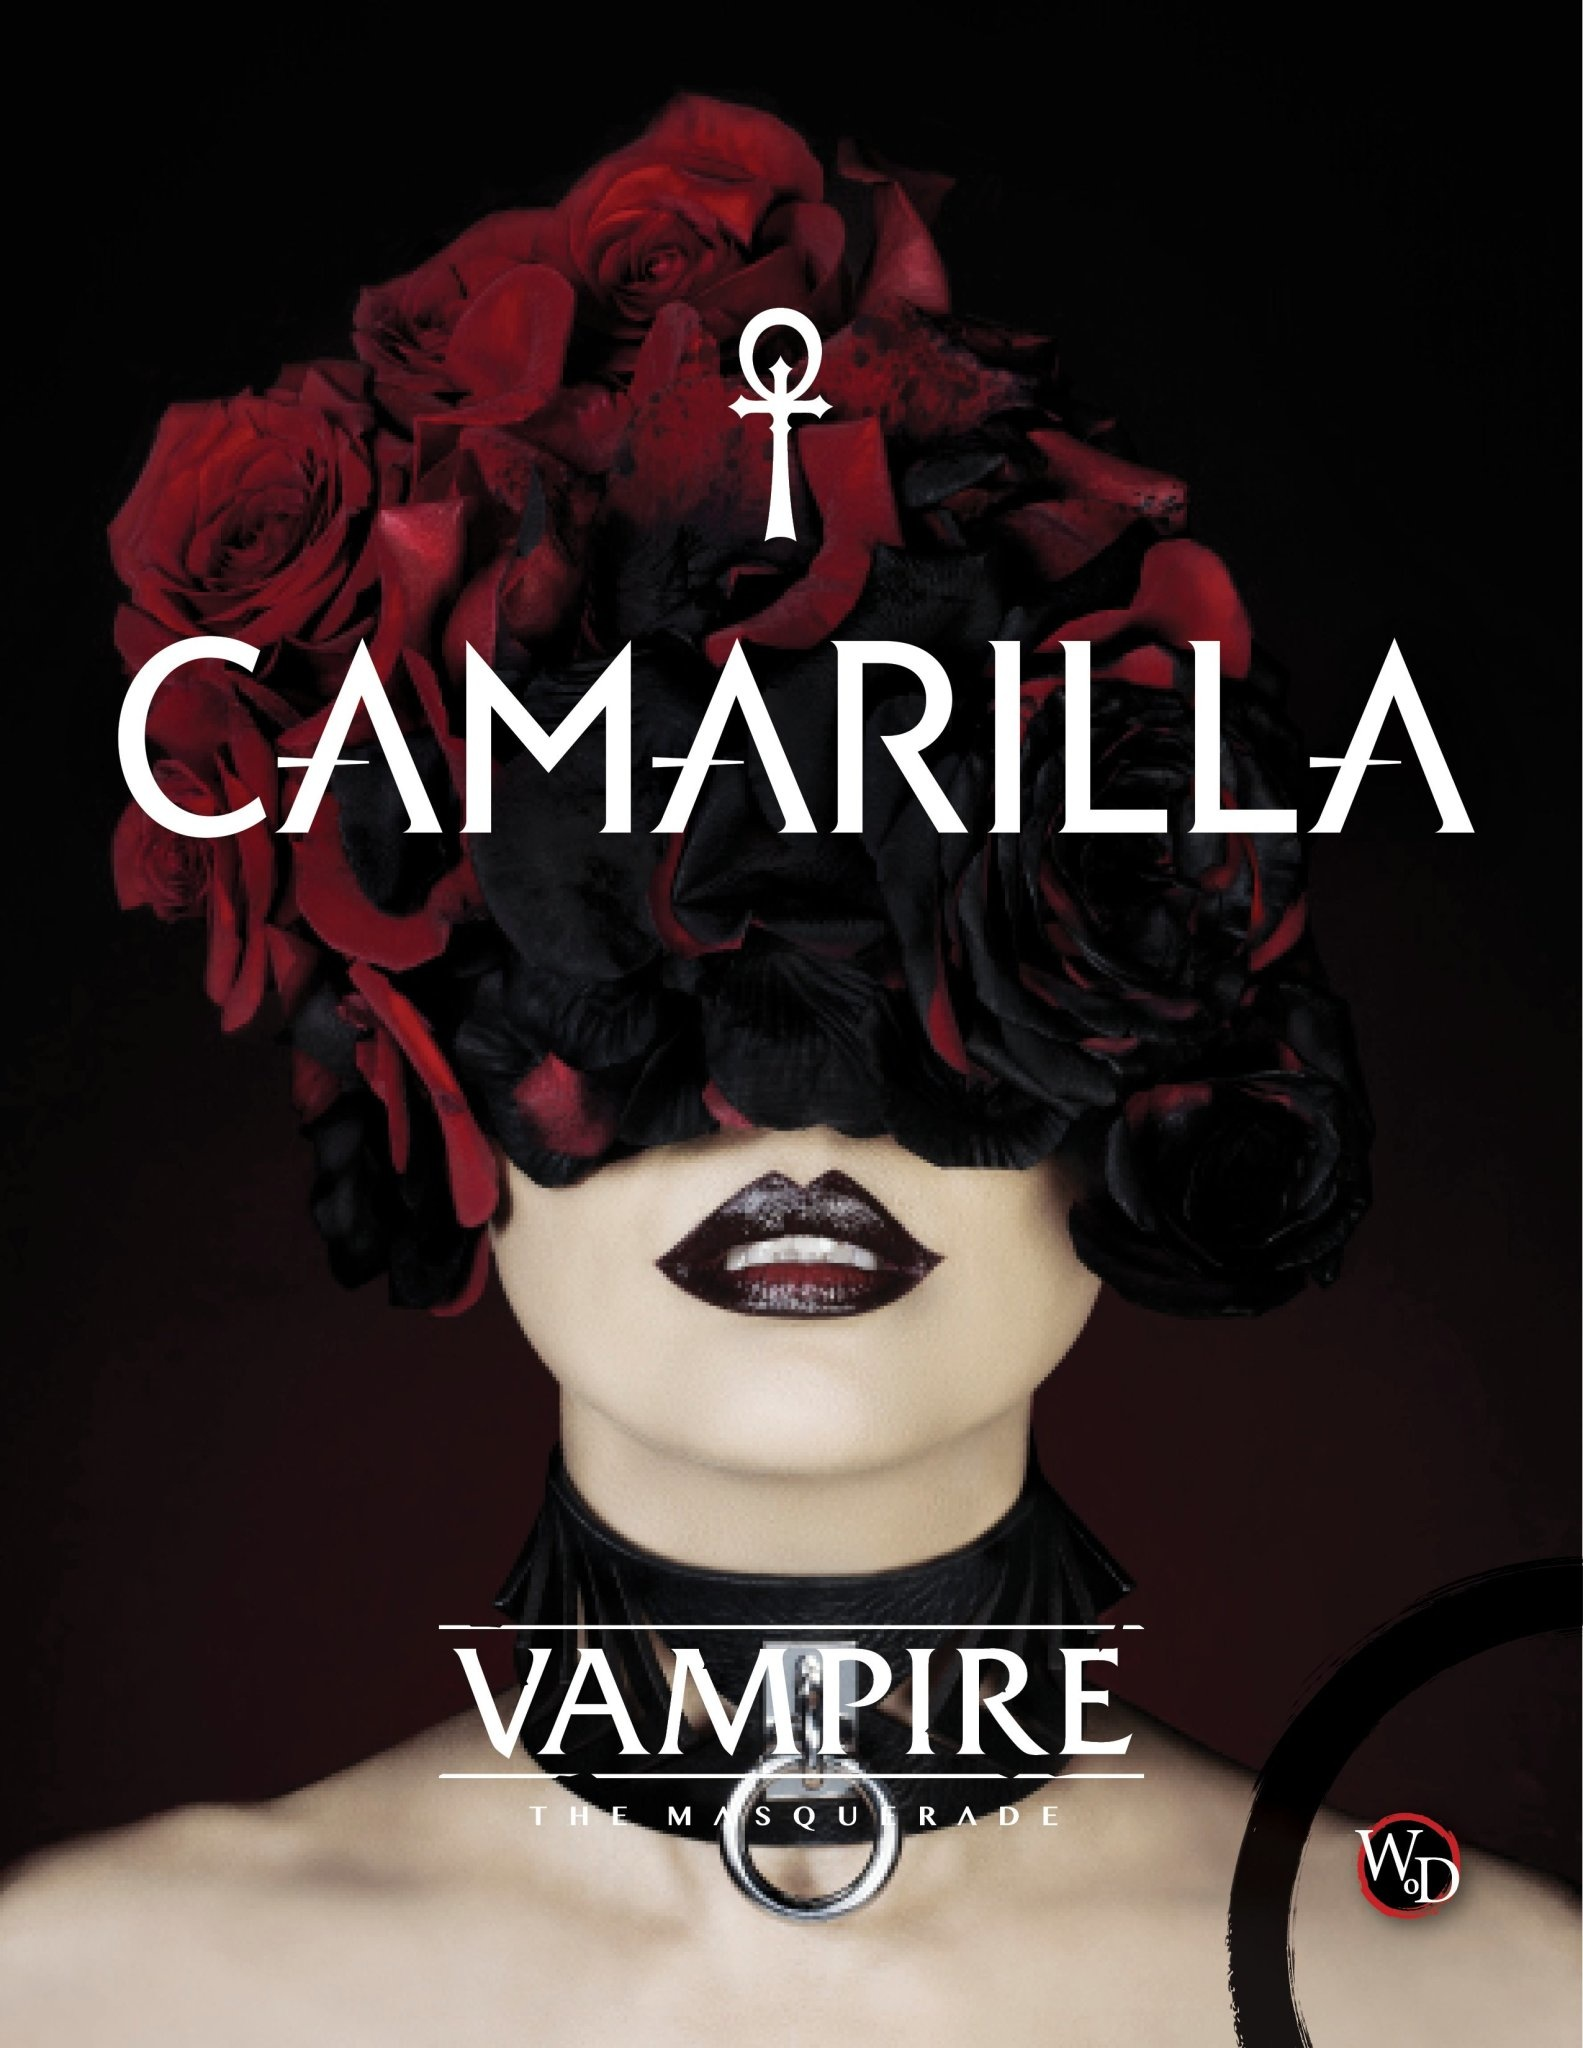 Vampire the Masquerade - Camarilla